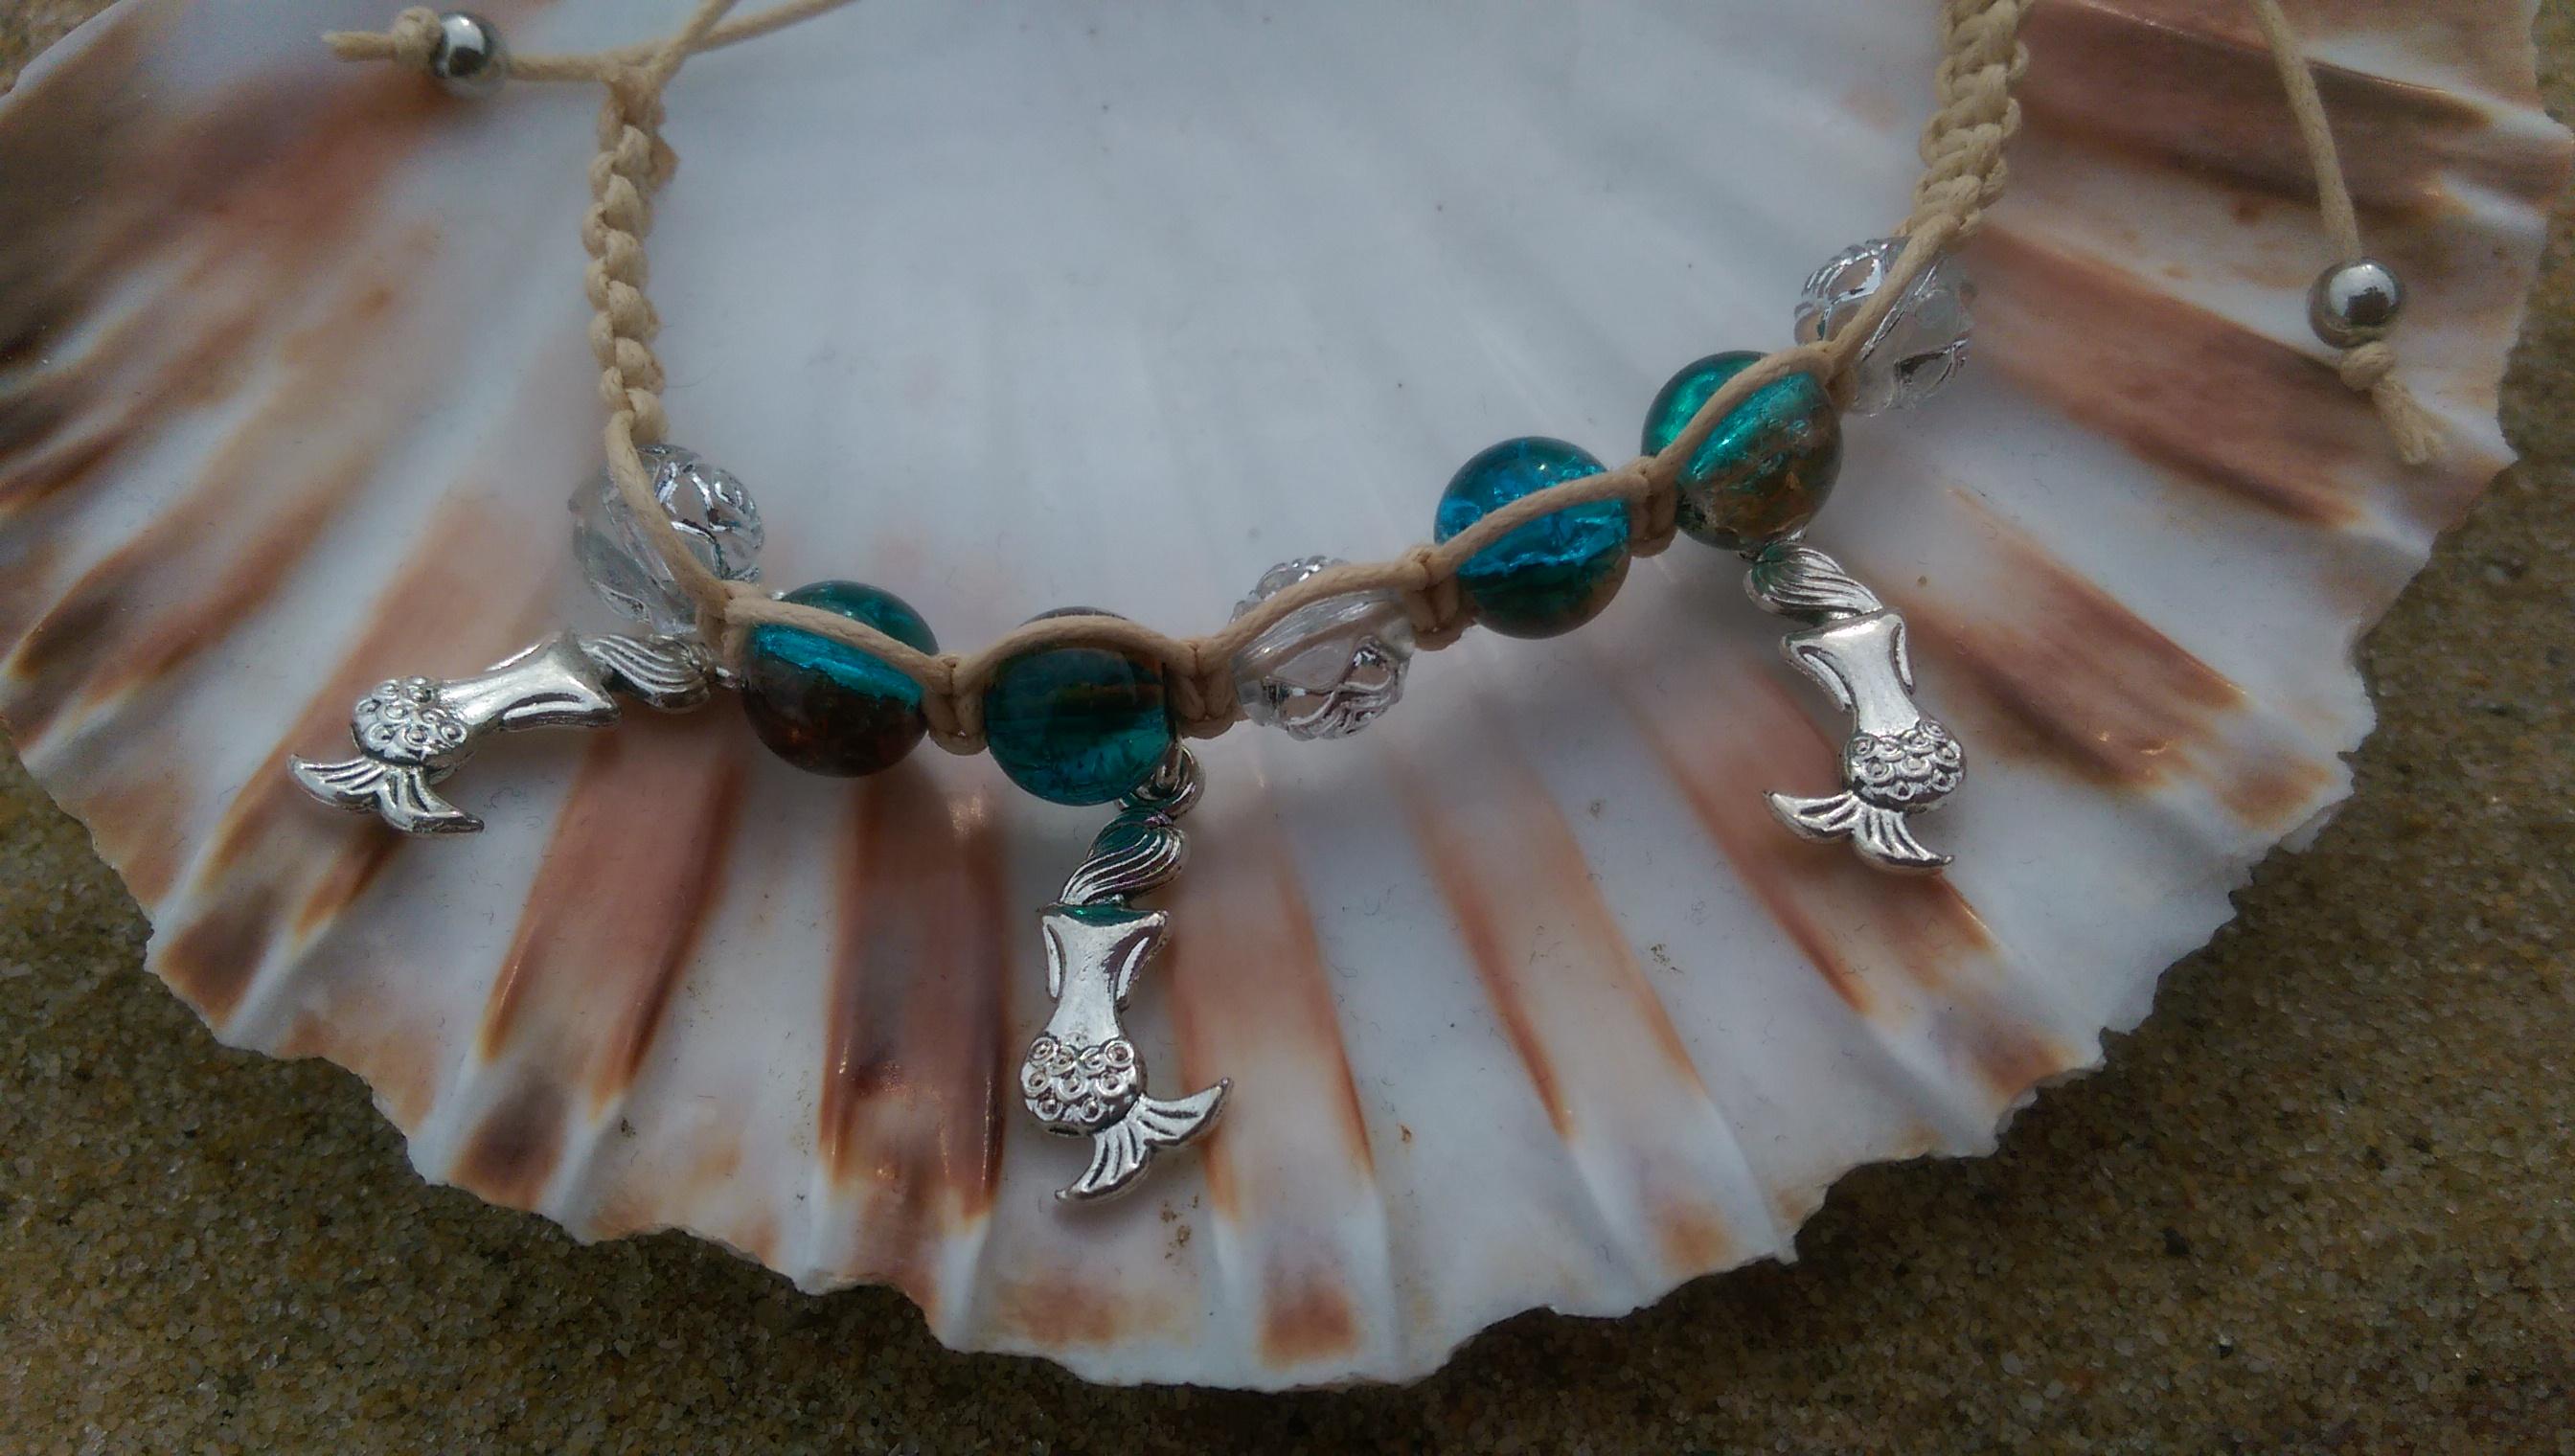 Shamballa-style with mermaid charms